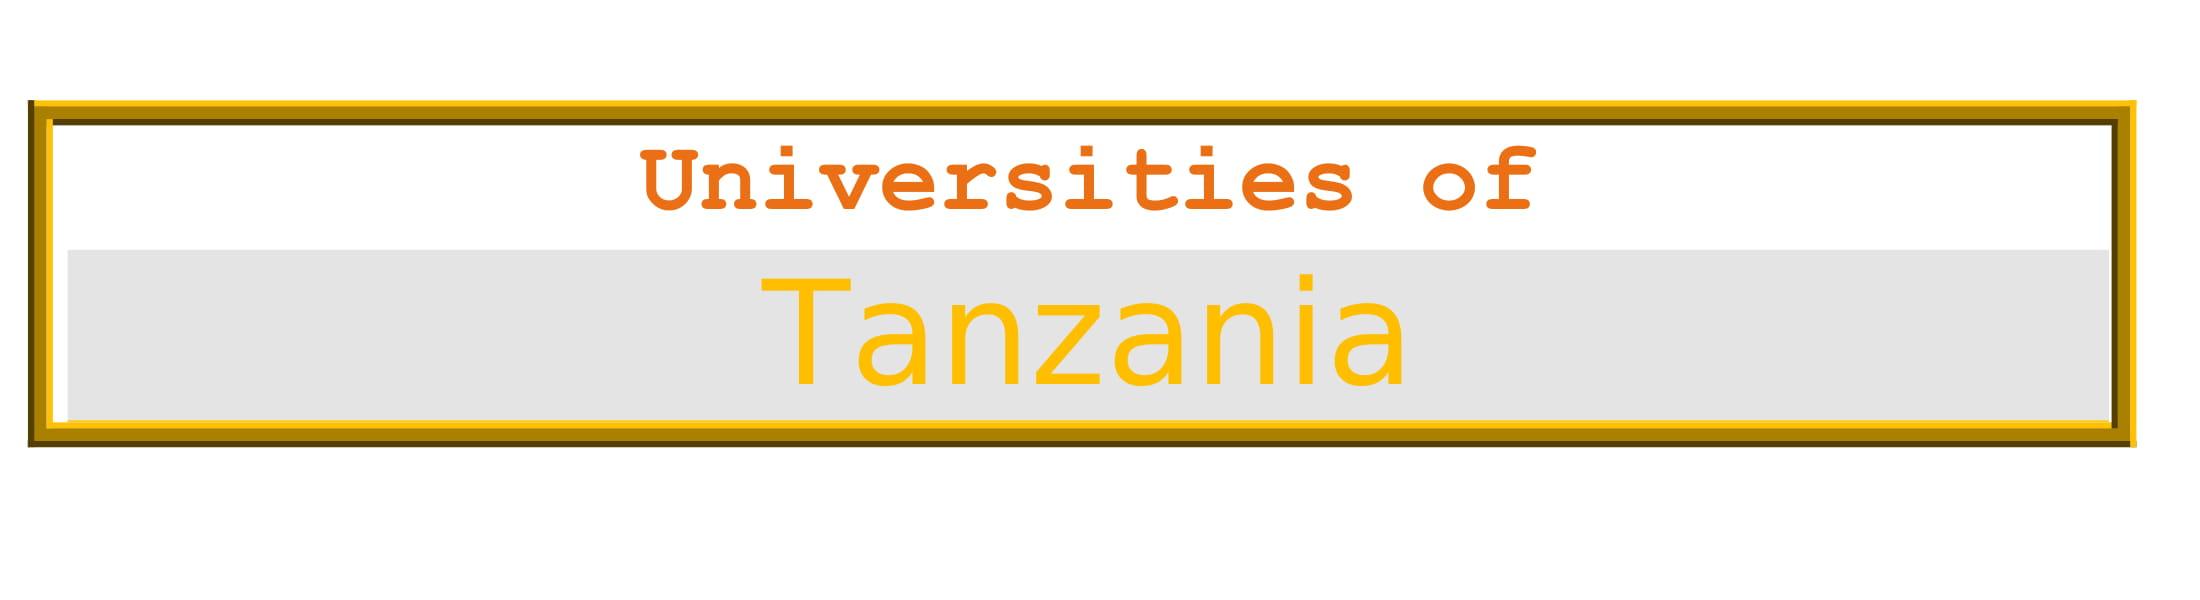 List of Universities in Tanzania